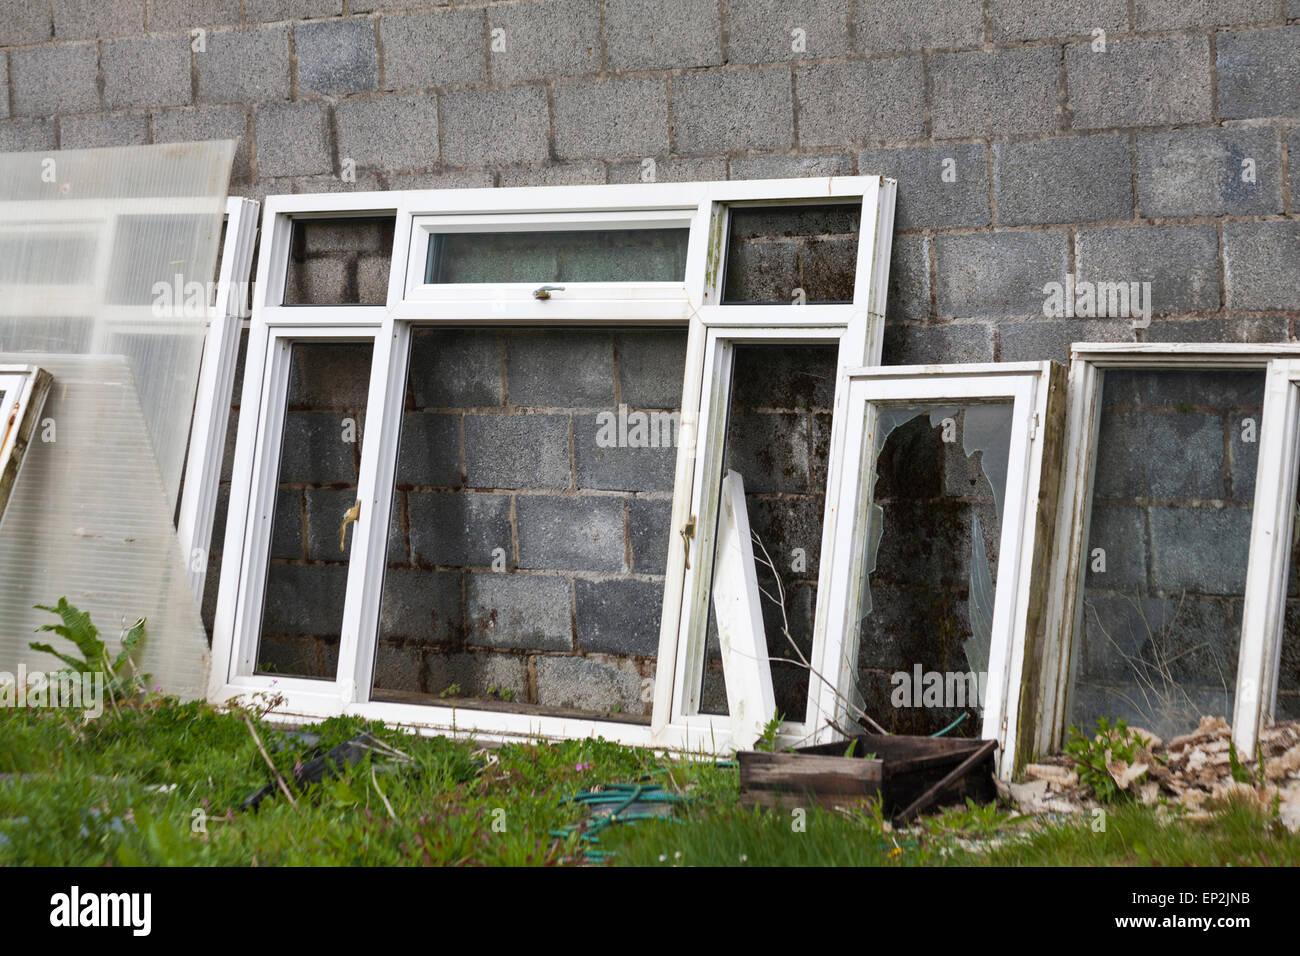 Windows Window Frames Frame Stockfotos & Windows Window Frames Frame ...